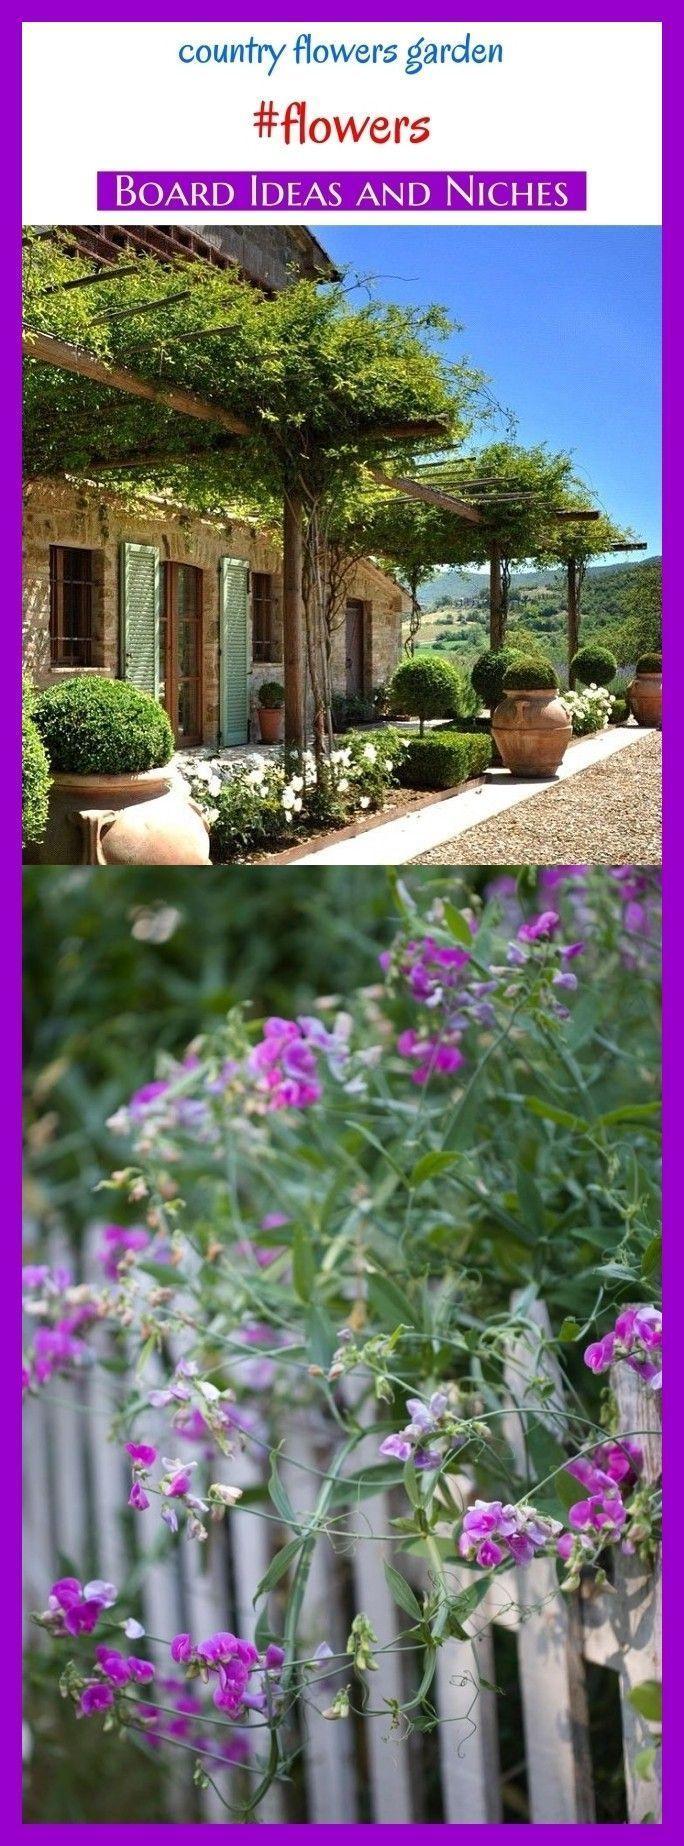 Photo of Country flower gardens #flower #seo #boardideas #garden. Flower, Garden Ideas, Blu …